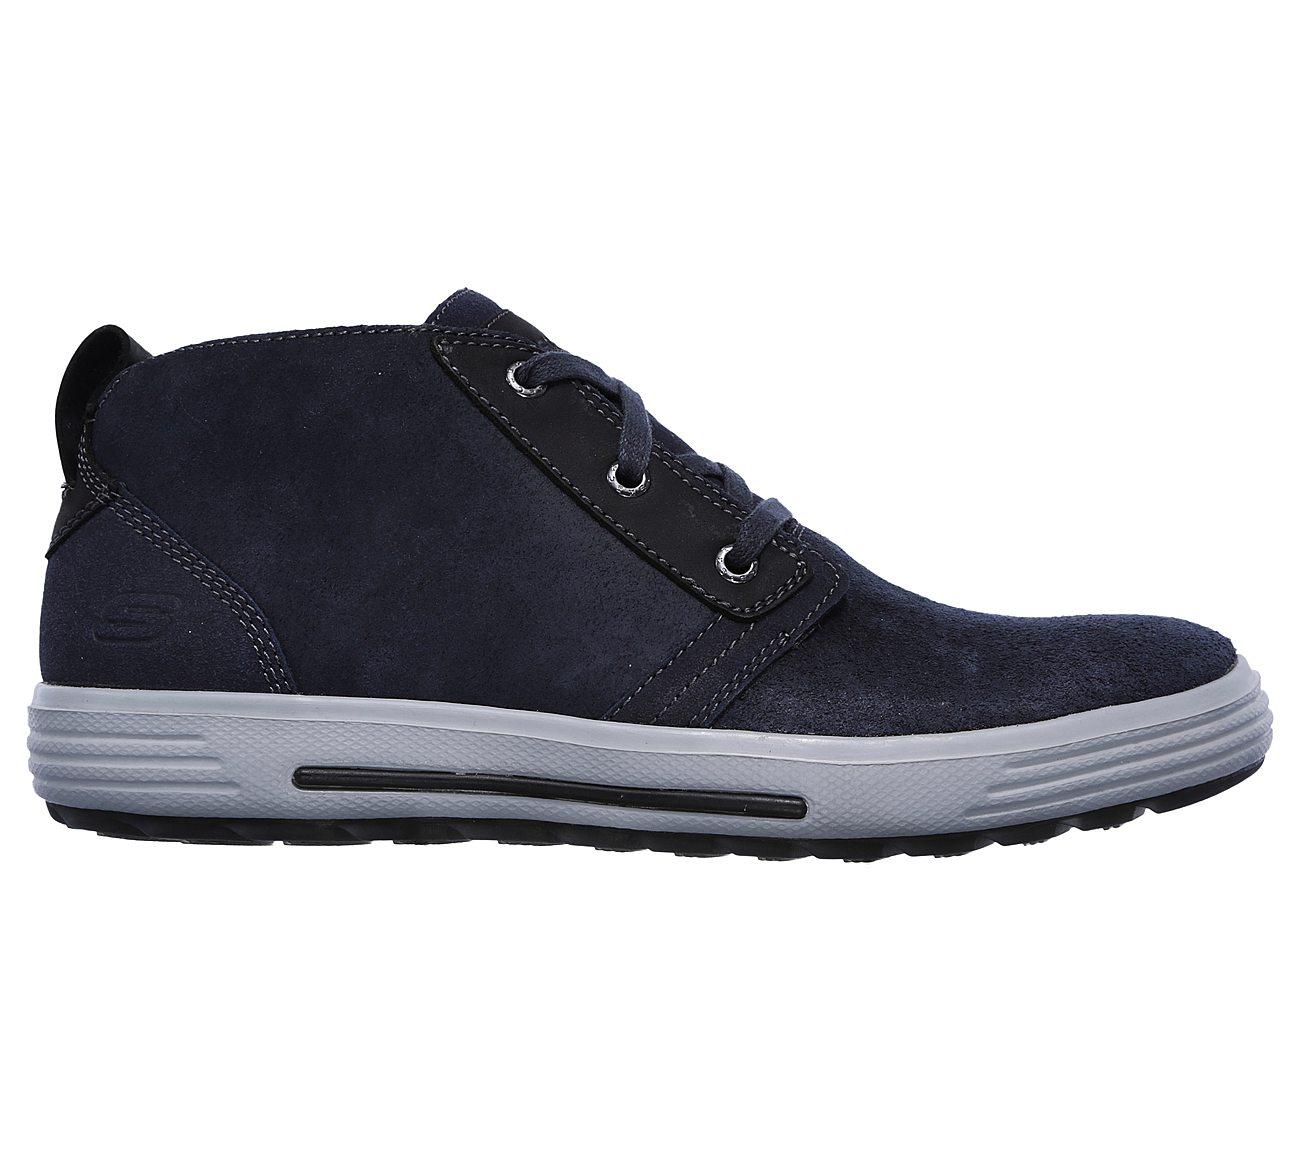 50f8bef2 Skechers Usa 00 Buy Only Malego Shoes Porter £67 tdStwqvf4